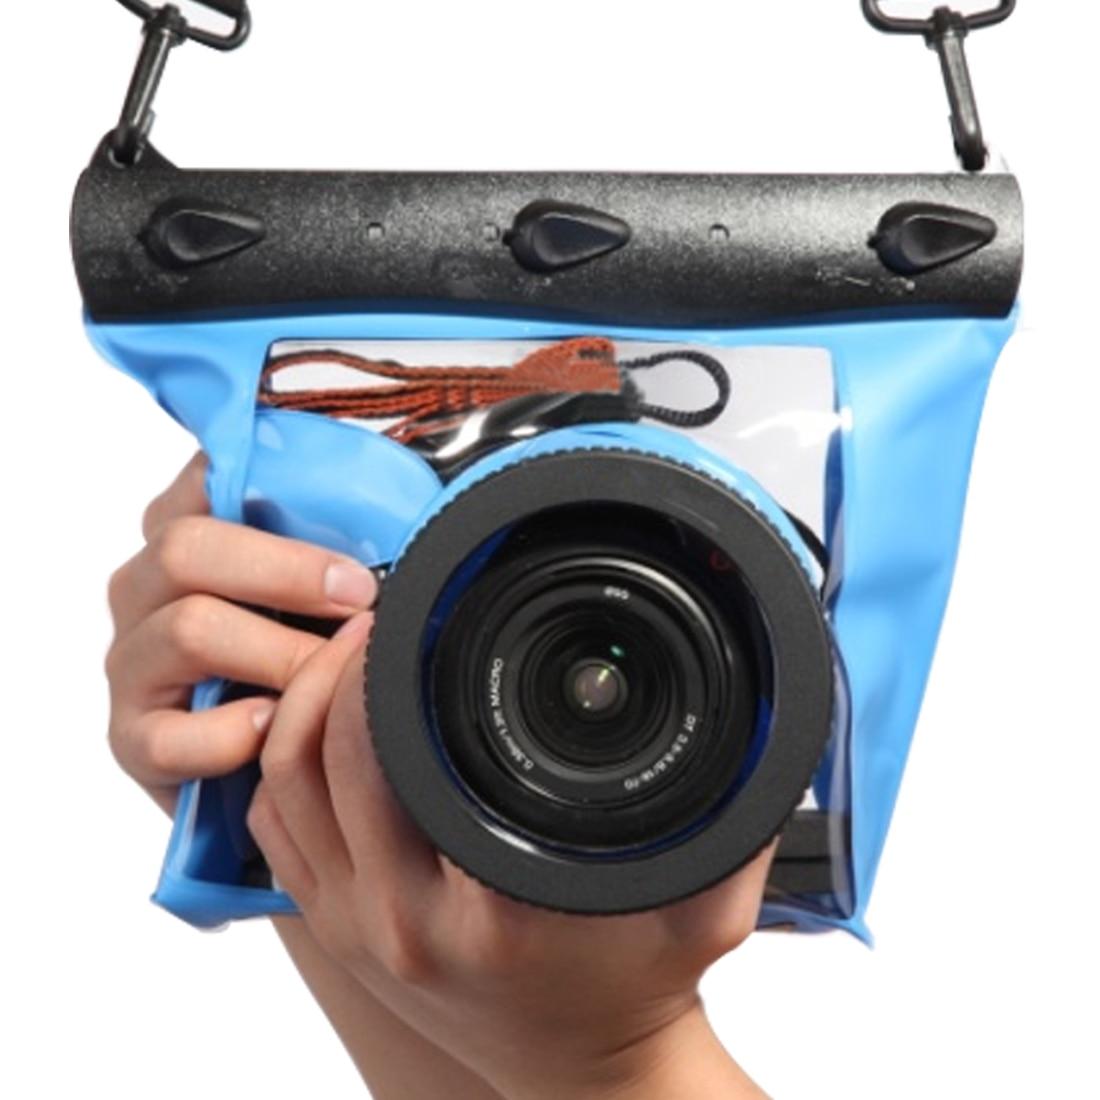 Centechia Underwater Diving Camera Housing Case Pouch Dry Bag Camera for Canon/Nikon/DSLR